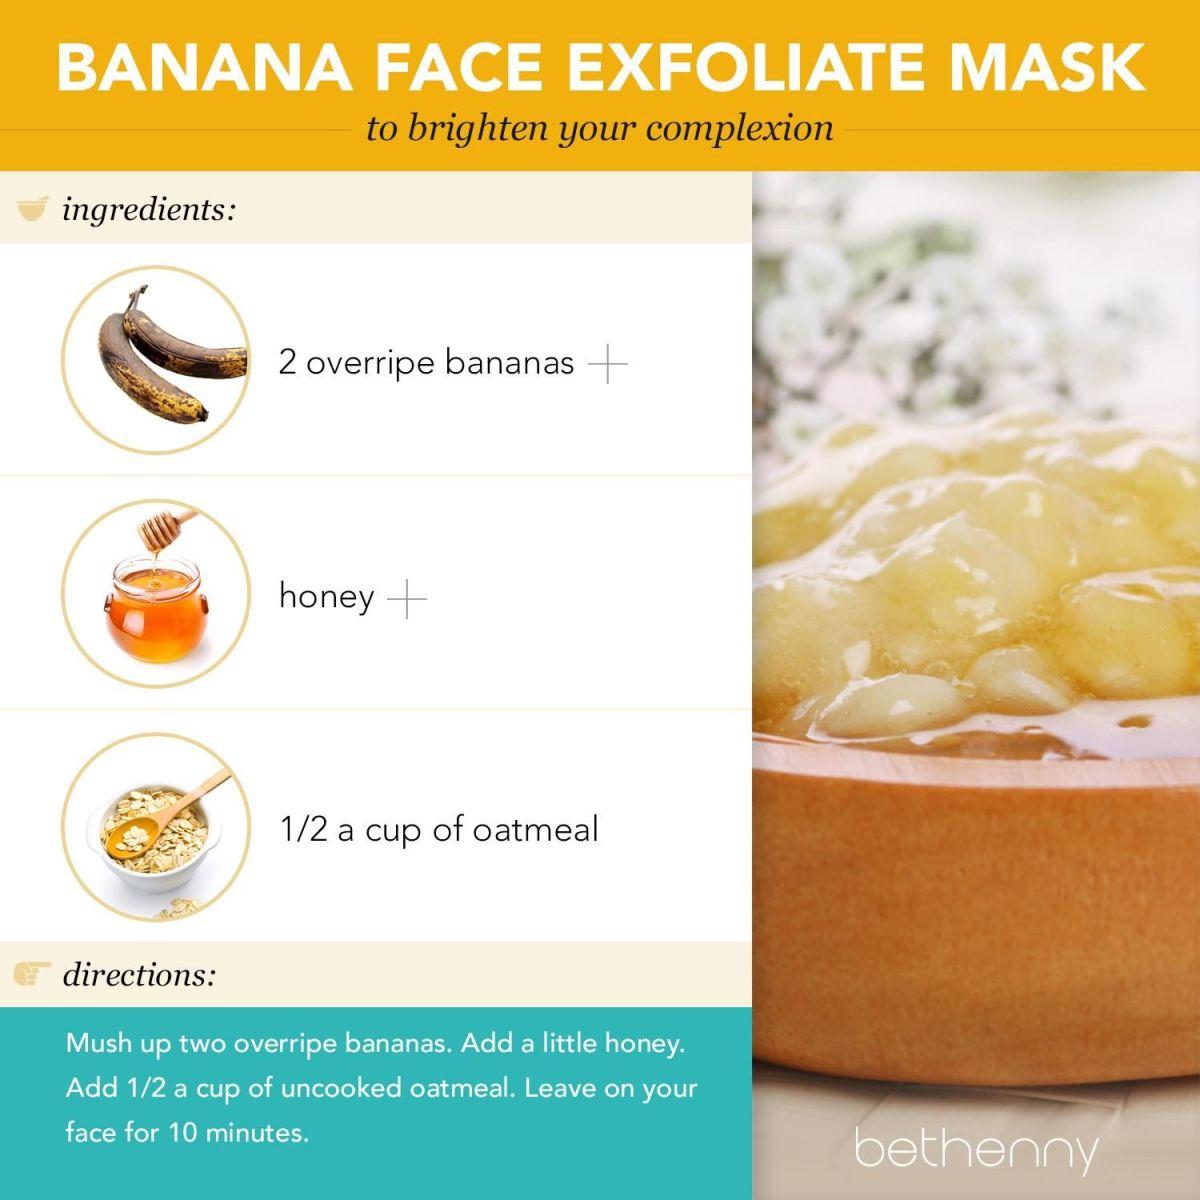 Banana and Oatmeal Mask